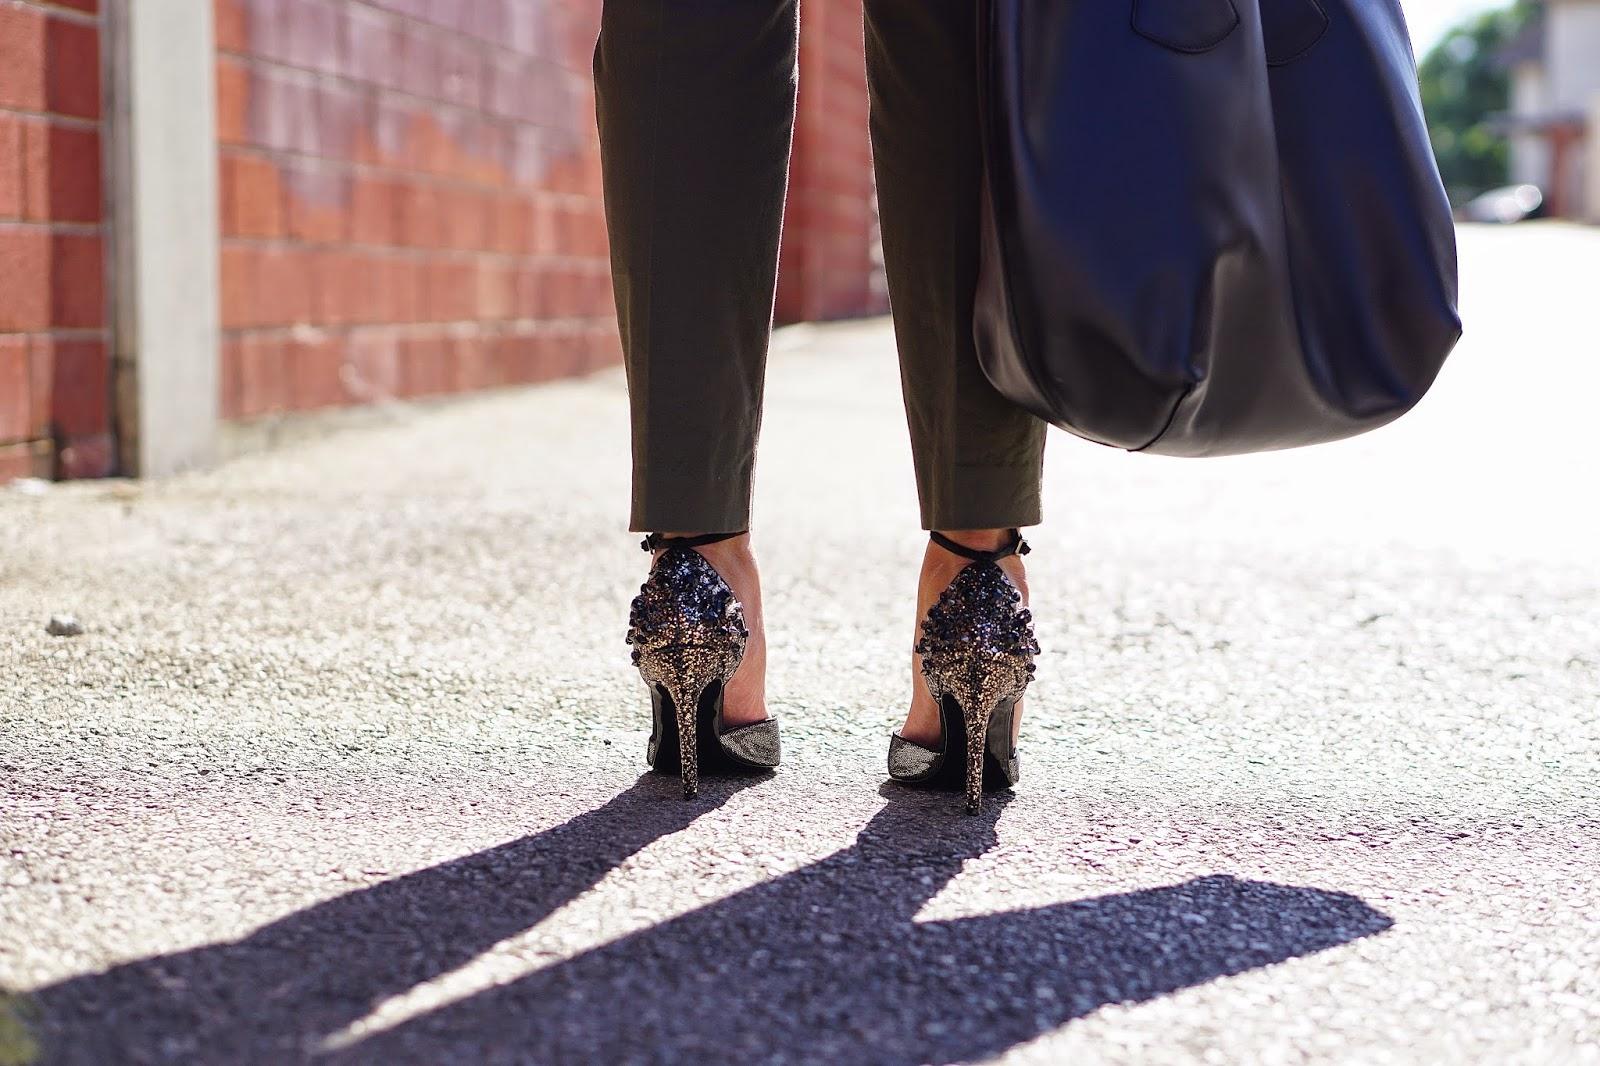 Foreign Exchange, Altuzarra for Target Black Blazer, MNG by Mango Olive Pants, JCPenney, Nina Shoes, Burlington Coat Factory, TJ Maxx, Black bucket bag, Fall Outfit Ideas